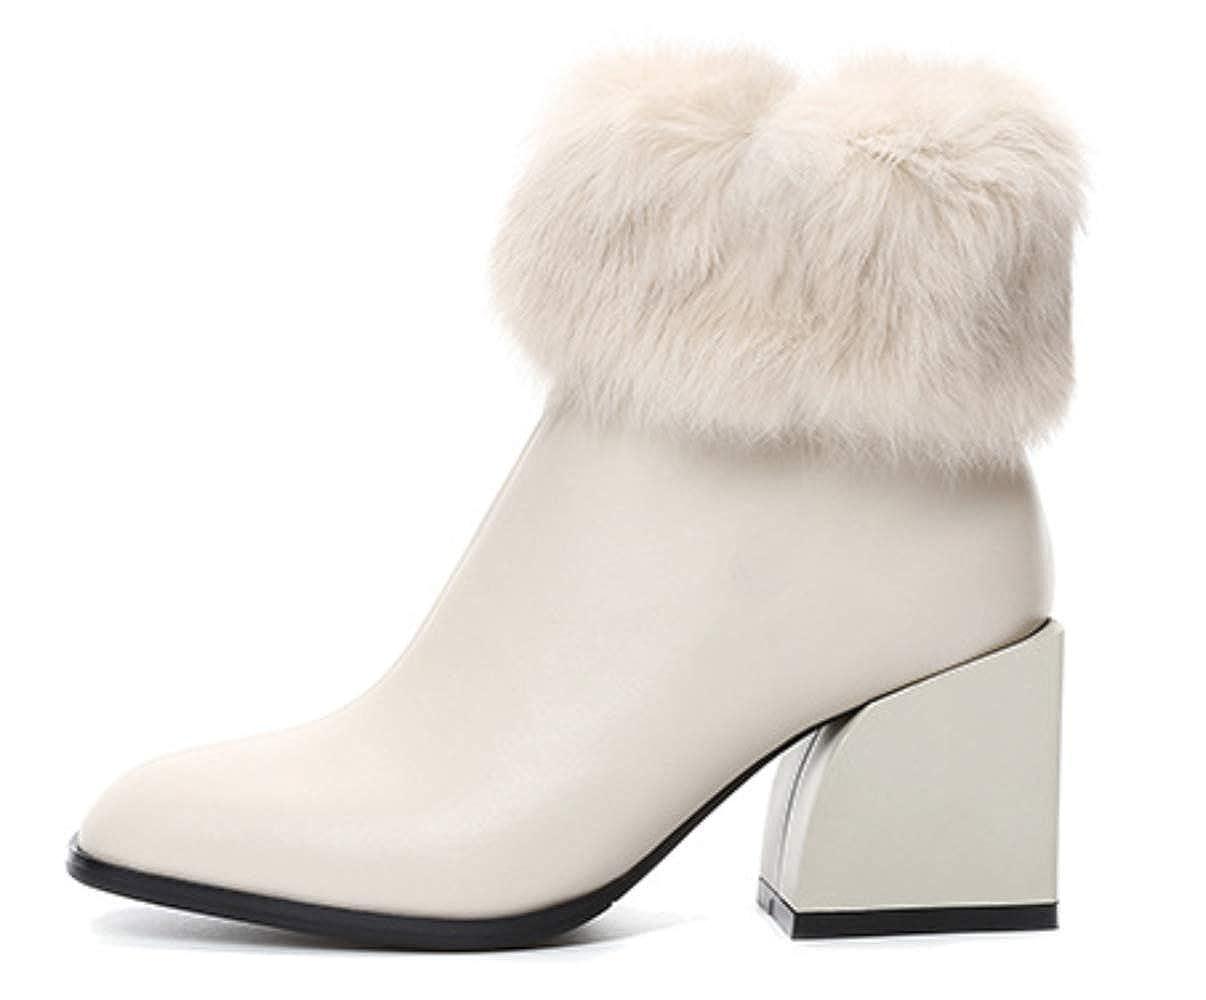 Shiney Damen High Heel Leder Stiefelies Weiblicher Reißverschluss Chunky Chunky Chunky Heel Plus Samt Martin Stiefel 5e0184